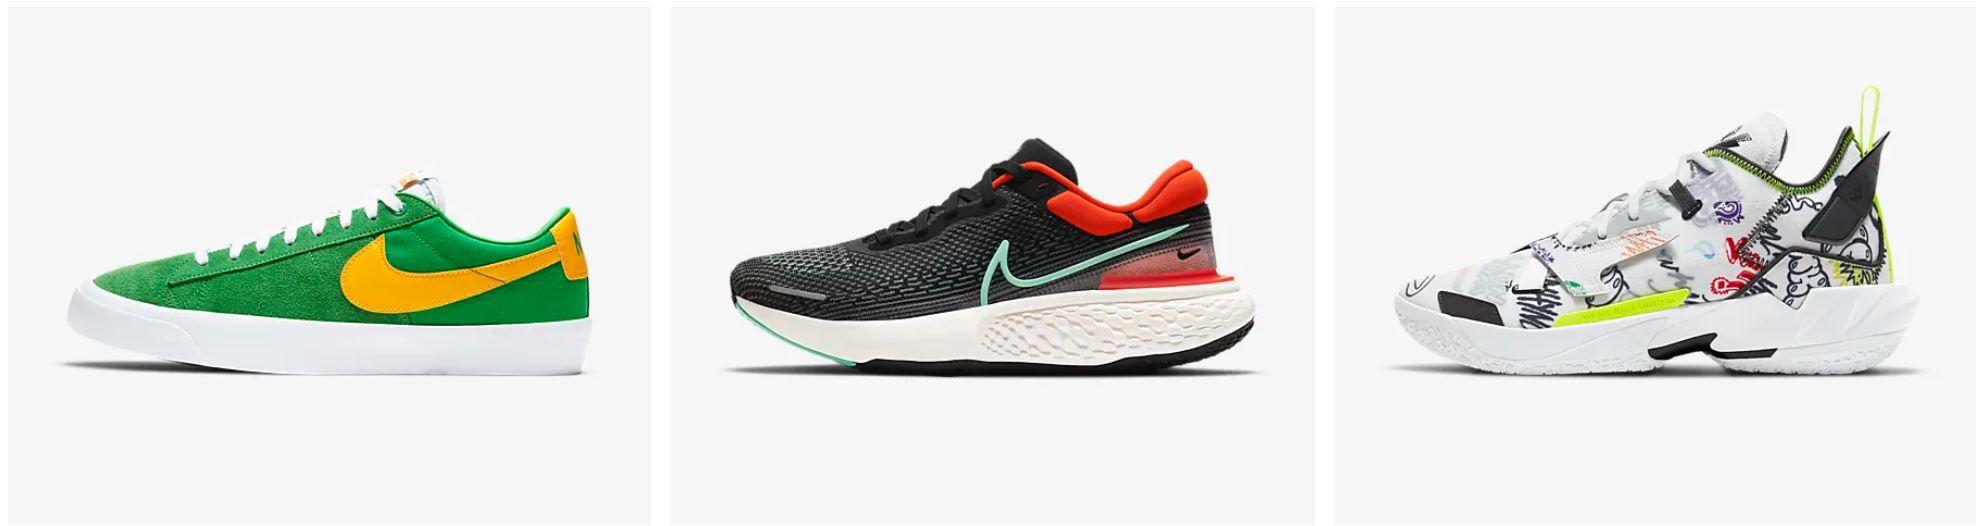 Nike Valentinsrabatt: 20% extra für Member auf Vollpreis Artikel